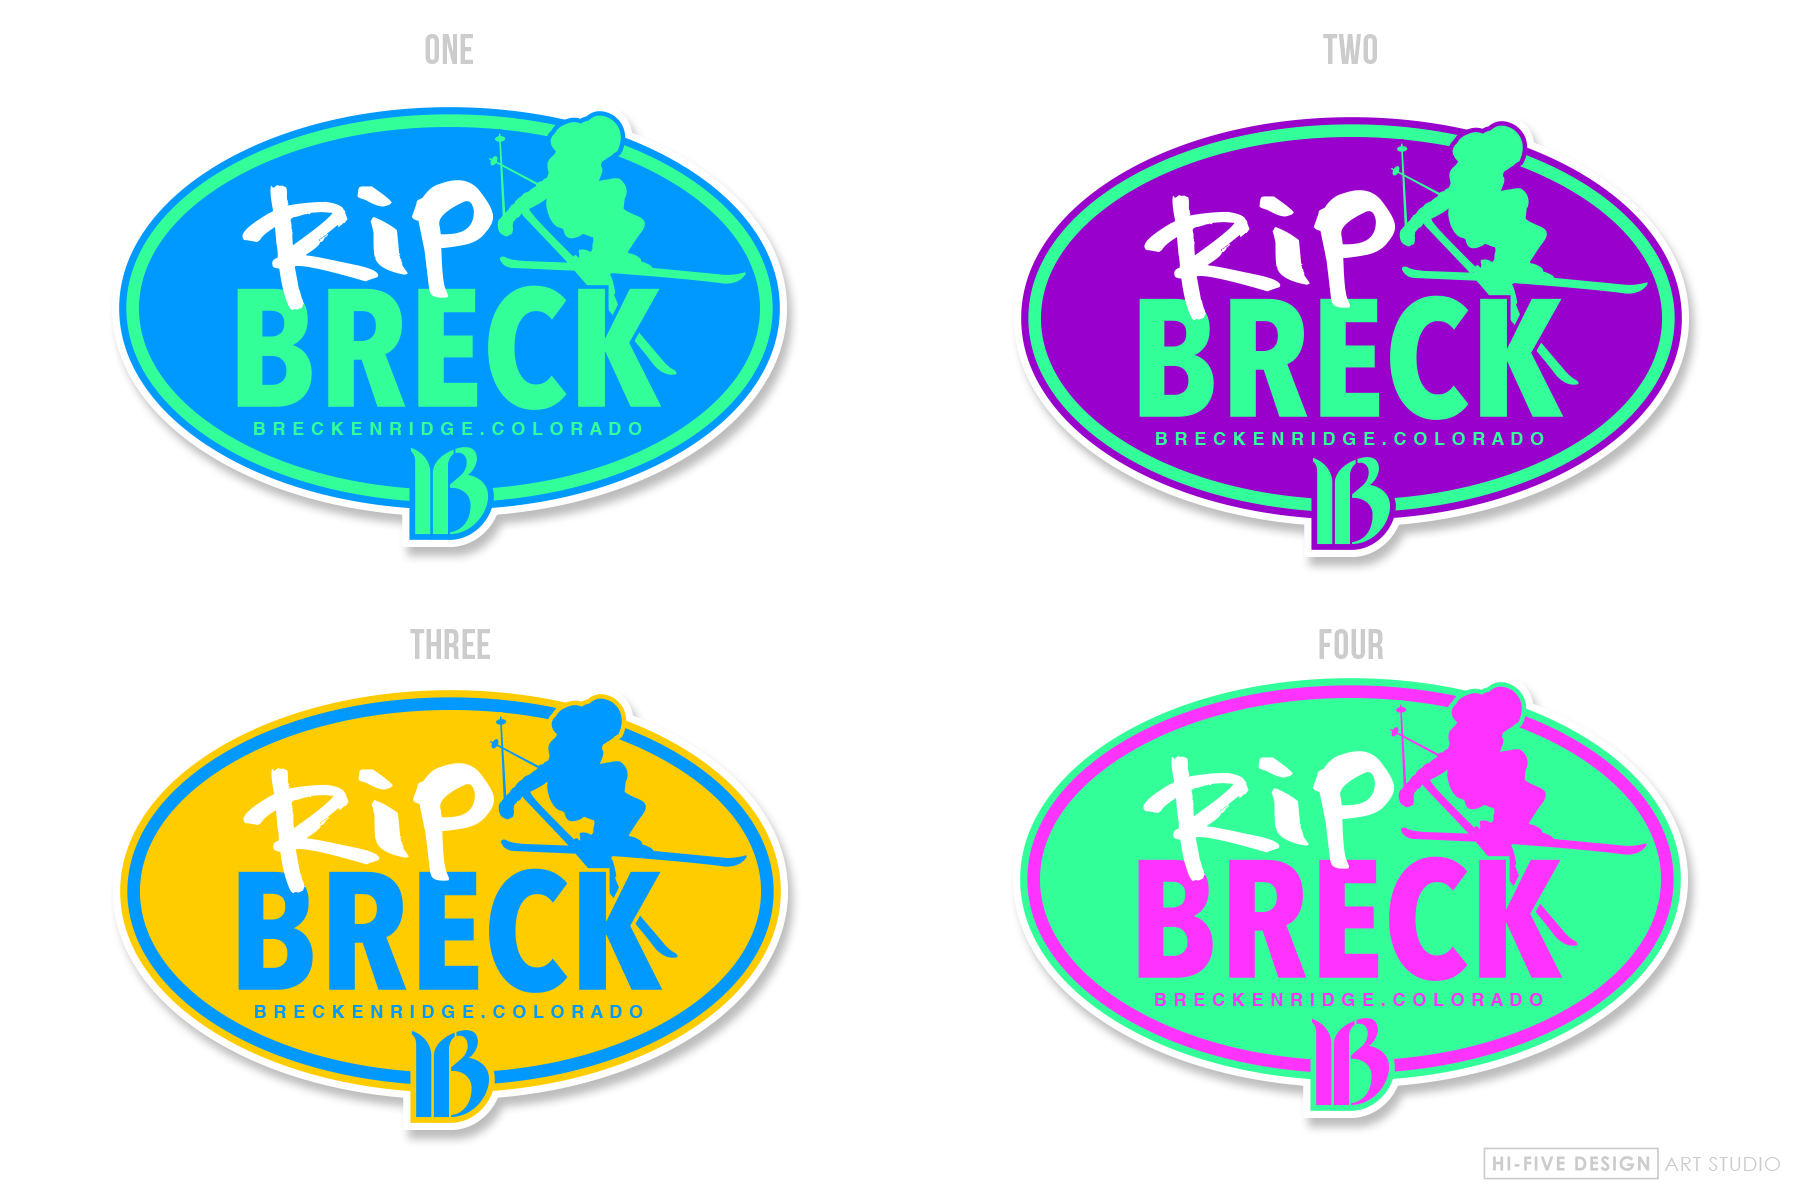 logo design colorado springs, graphic designer colorado springs, colorado logo, colorado design, sticker designer colorado springs, sticker designer denver, graphic designer colorado springs, graphic designer denver, artist colorado springs, artist denver, skier sticker breckenridge, snowboarder sticker vail, skier sticker vail, snowboarder sticker breckenridge